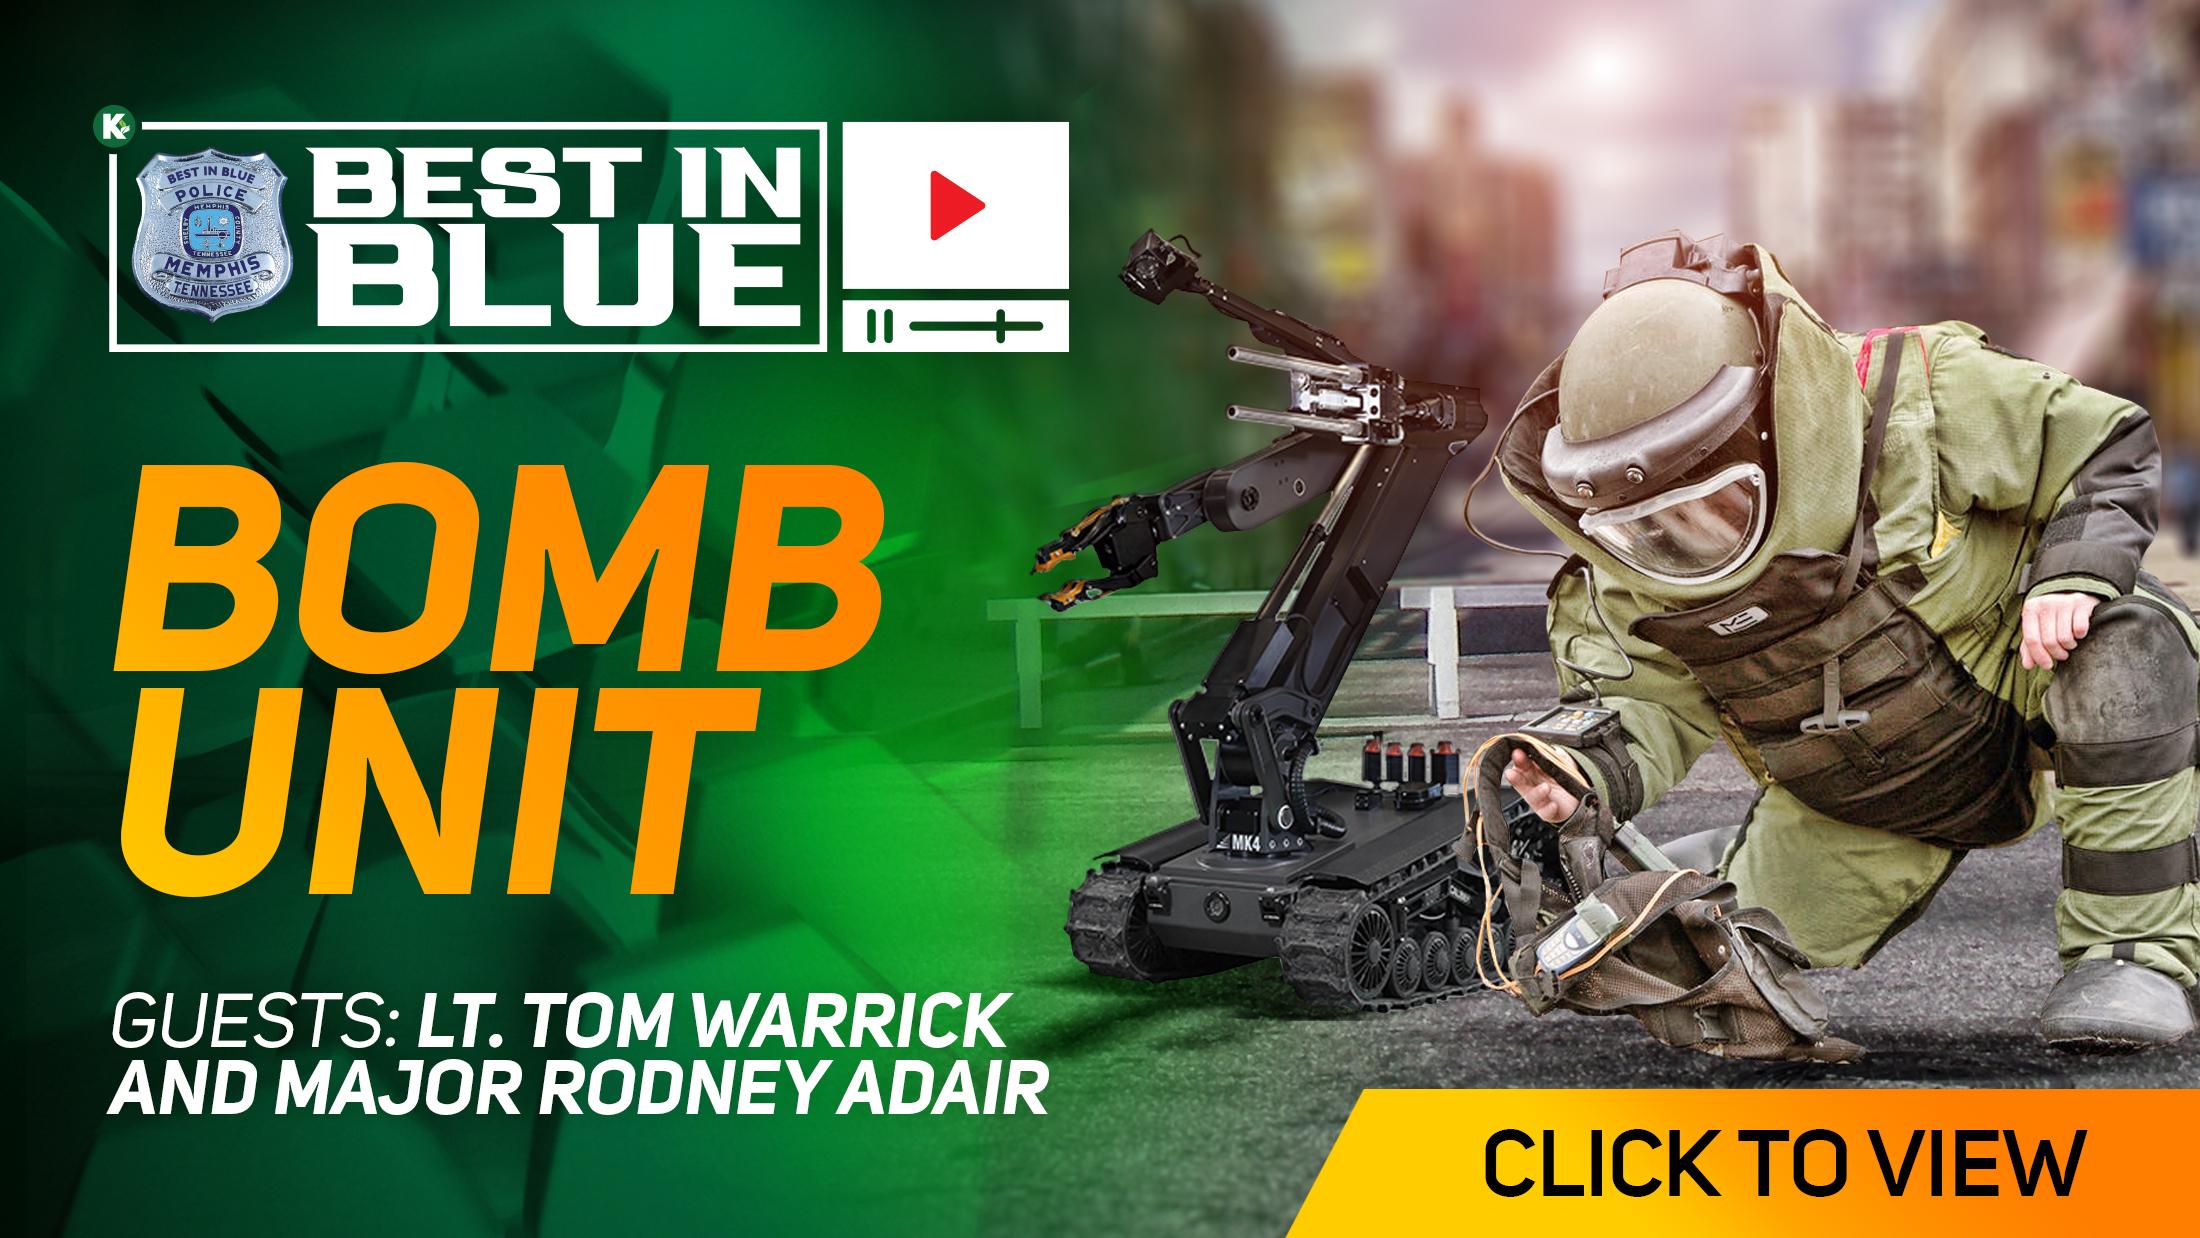 Artwork for BEST In BLUE TV - S2E3   Bomb Unit  w/ Major R. Adair and Lt. T. Warrick   KUDZUKIAN